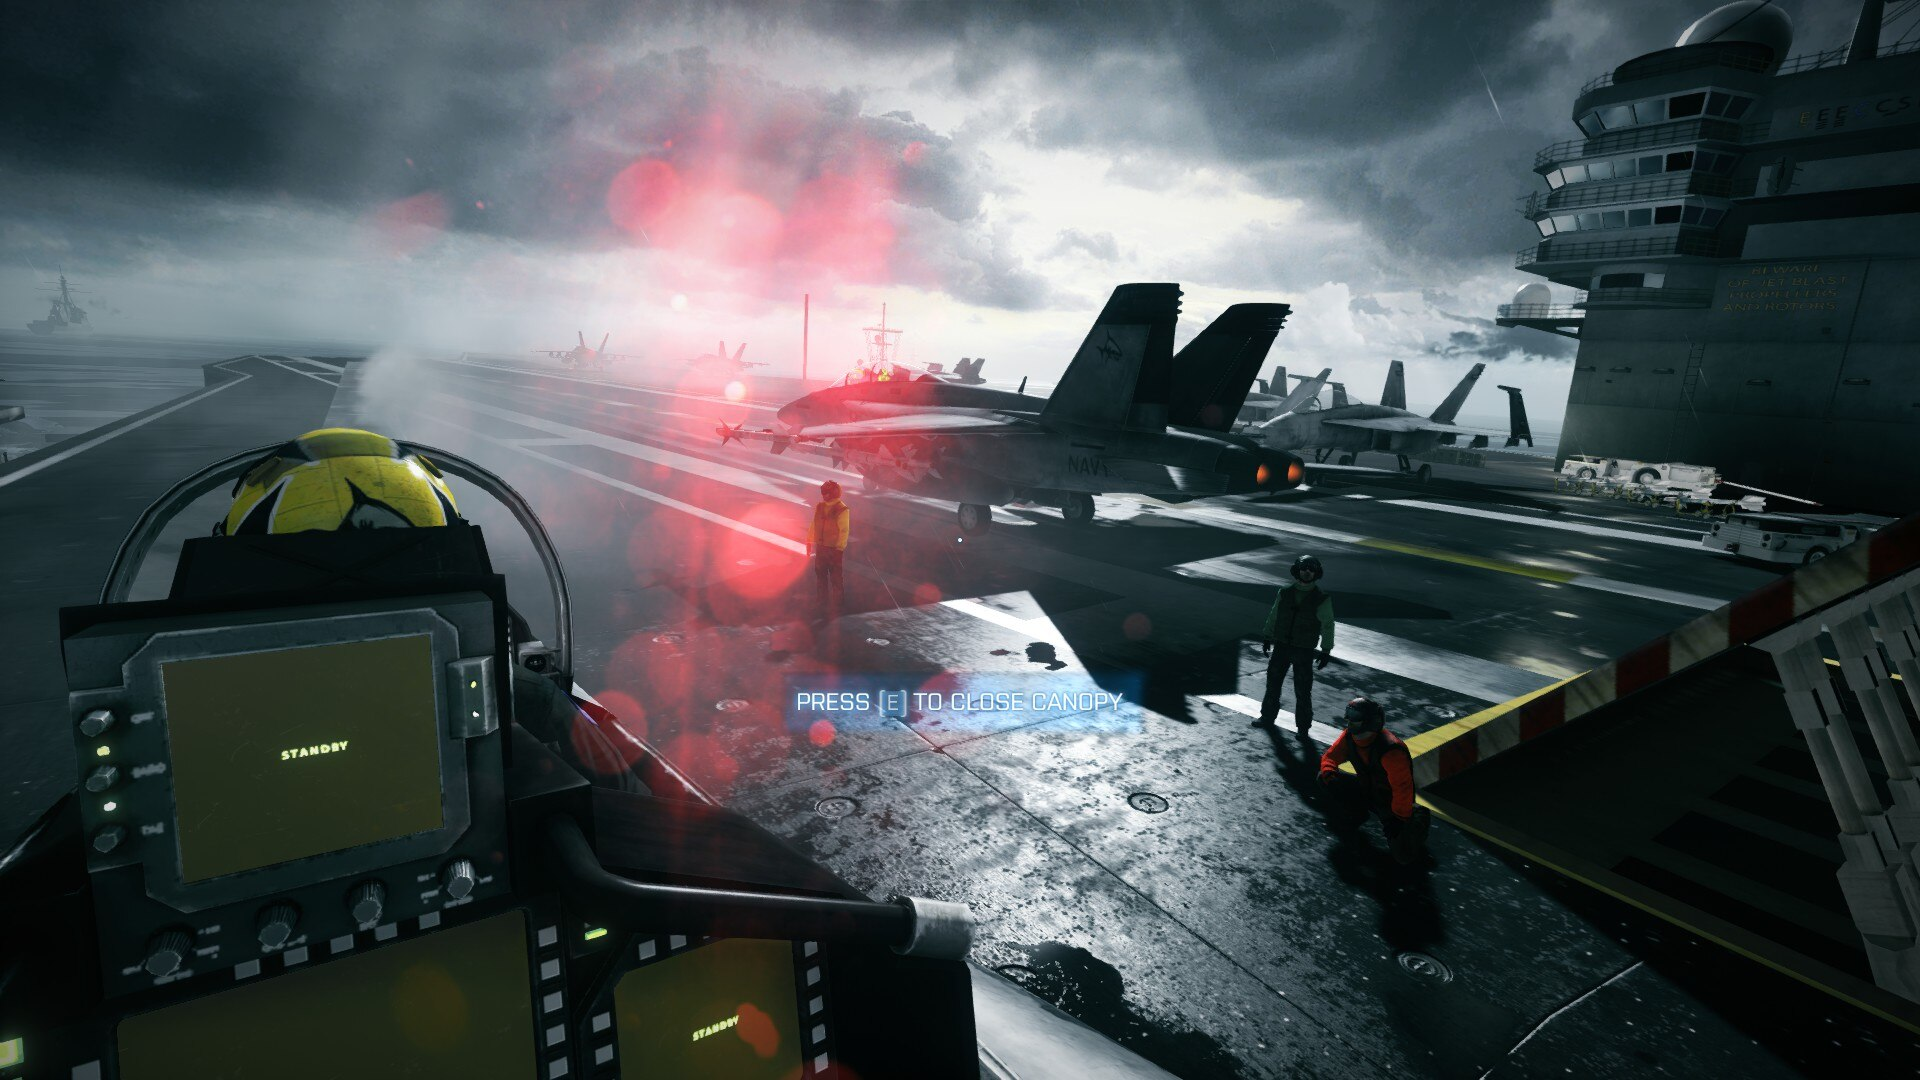 fghnbgfv.jpg - Battlefield 3